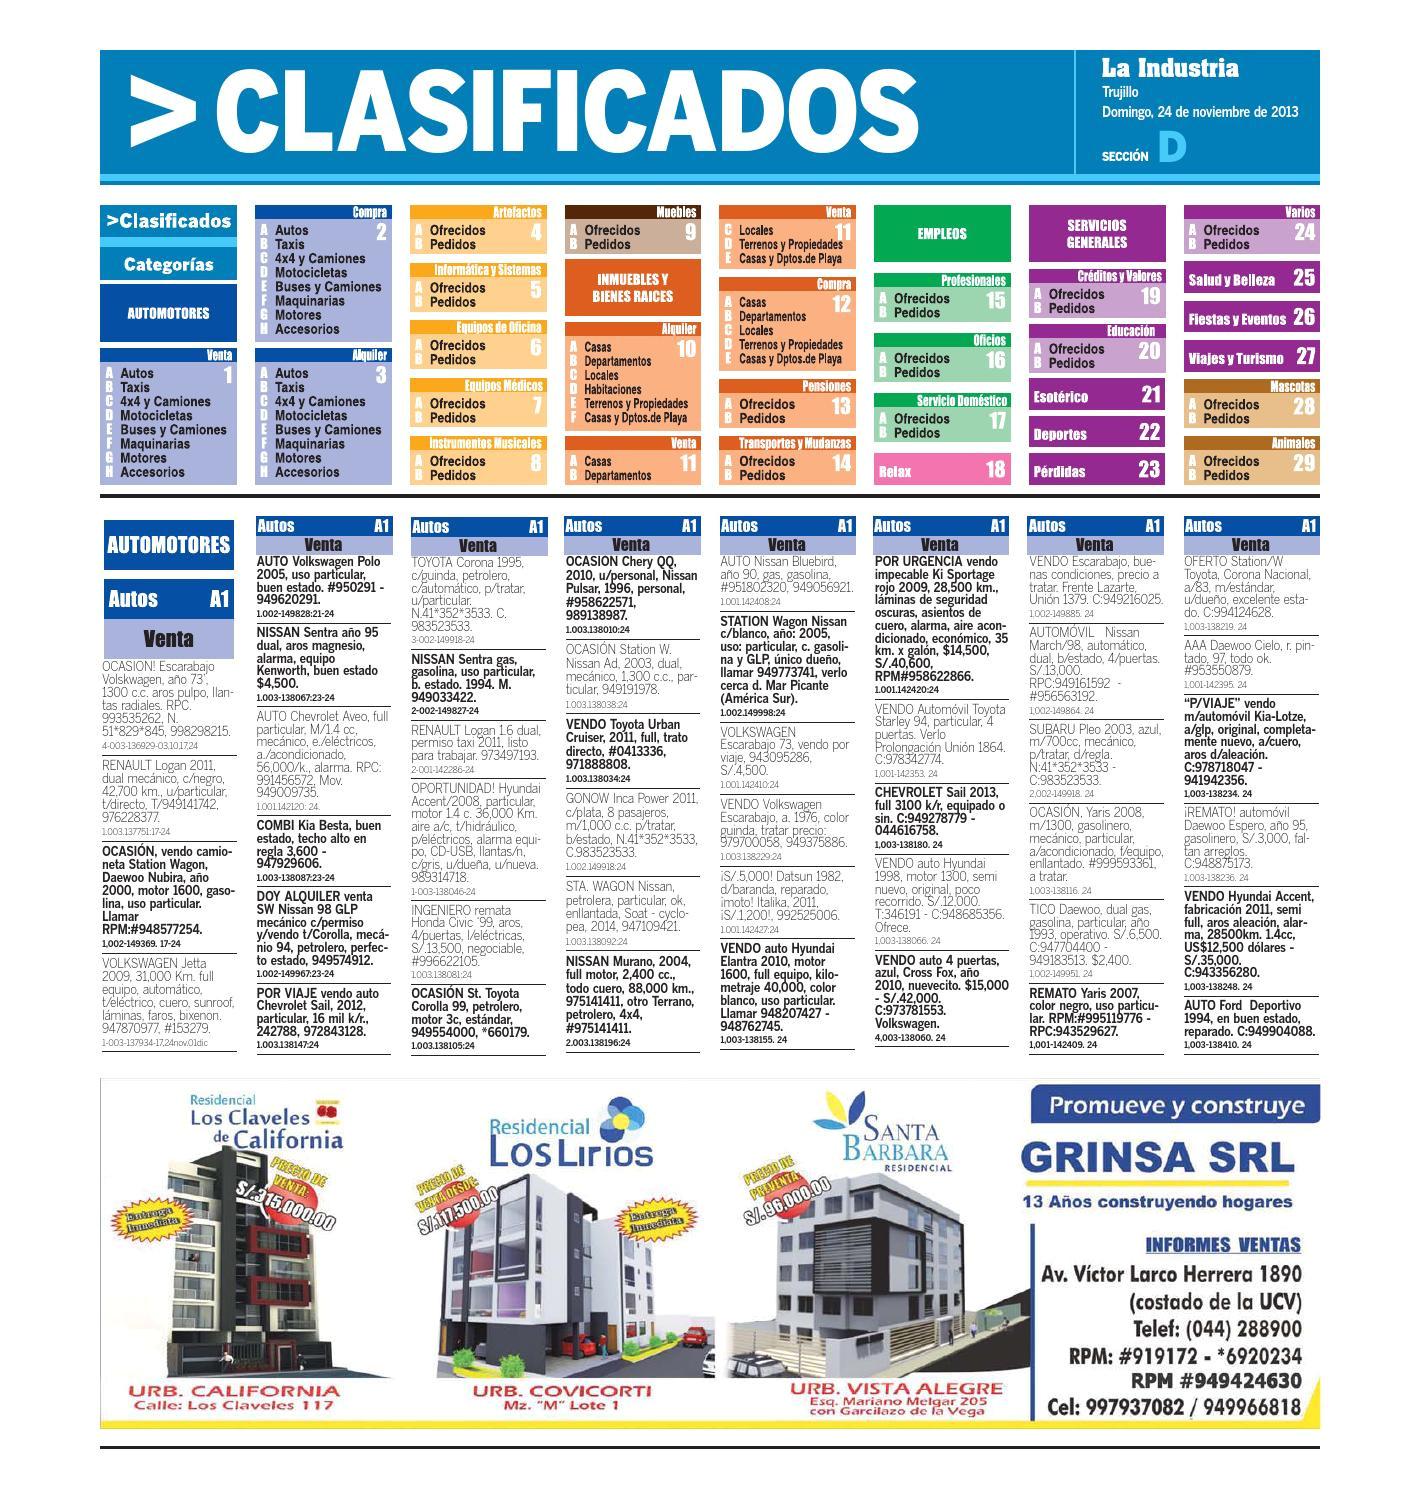 la industria trujillo clasificados 24 nov 2013 by alejandro obregon solano issuu